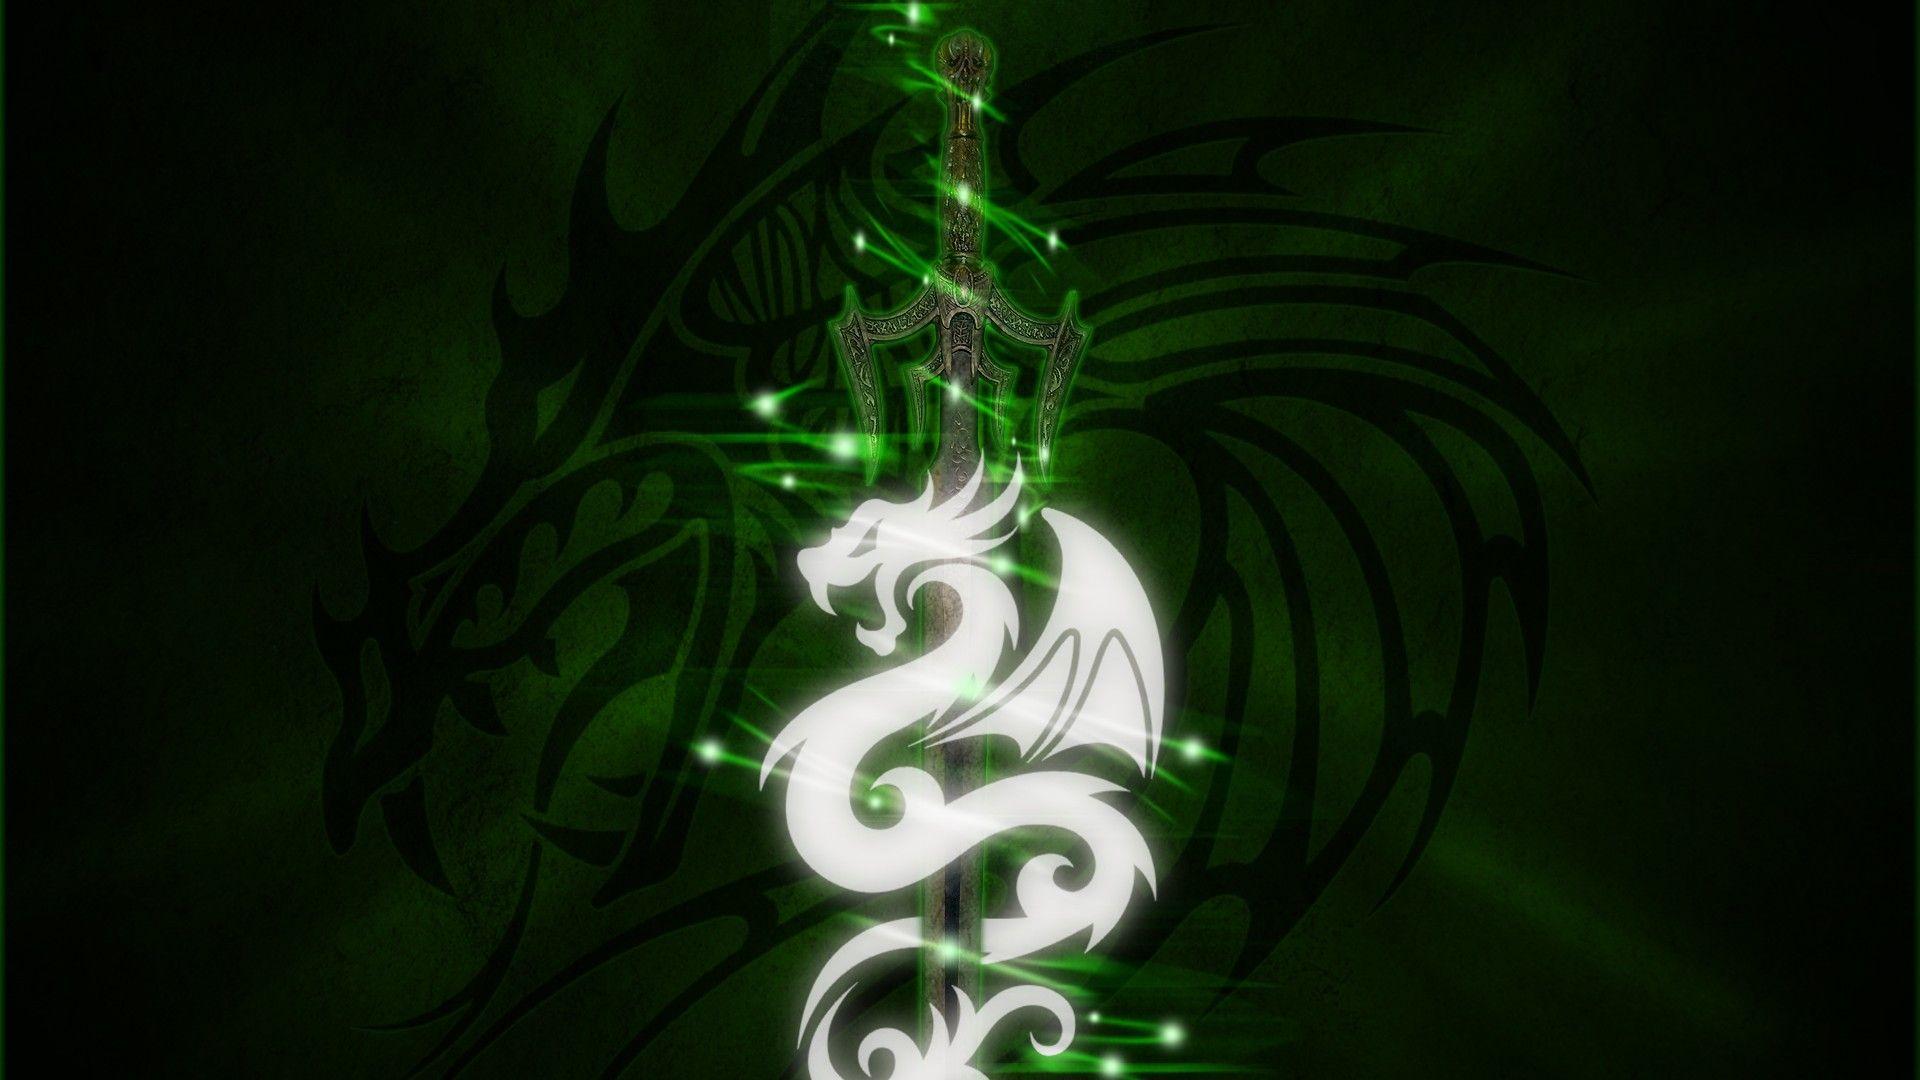 Dragon Sword Wallpapers Full Hd Desktop Wallpaper Box H Dragon